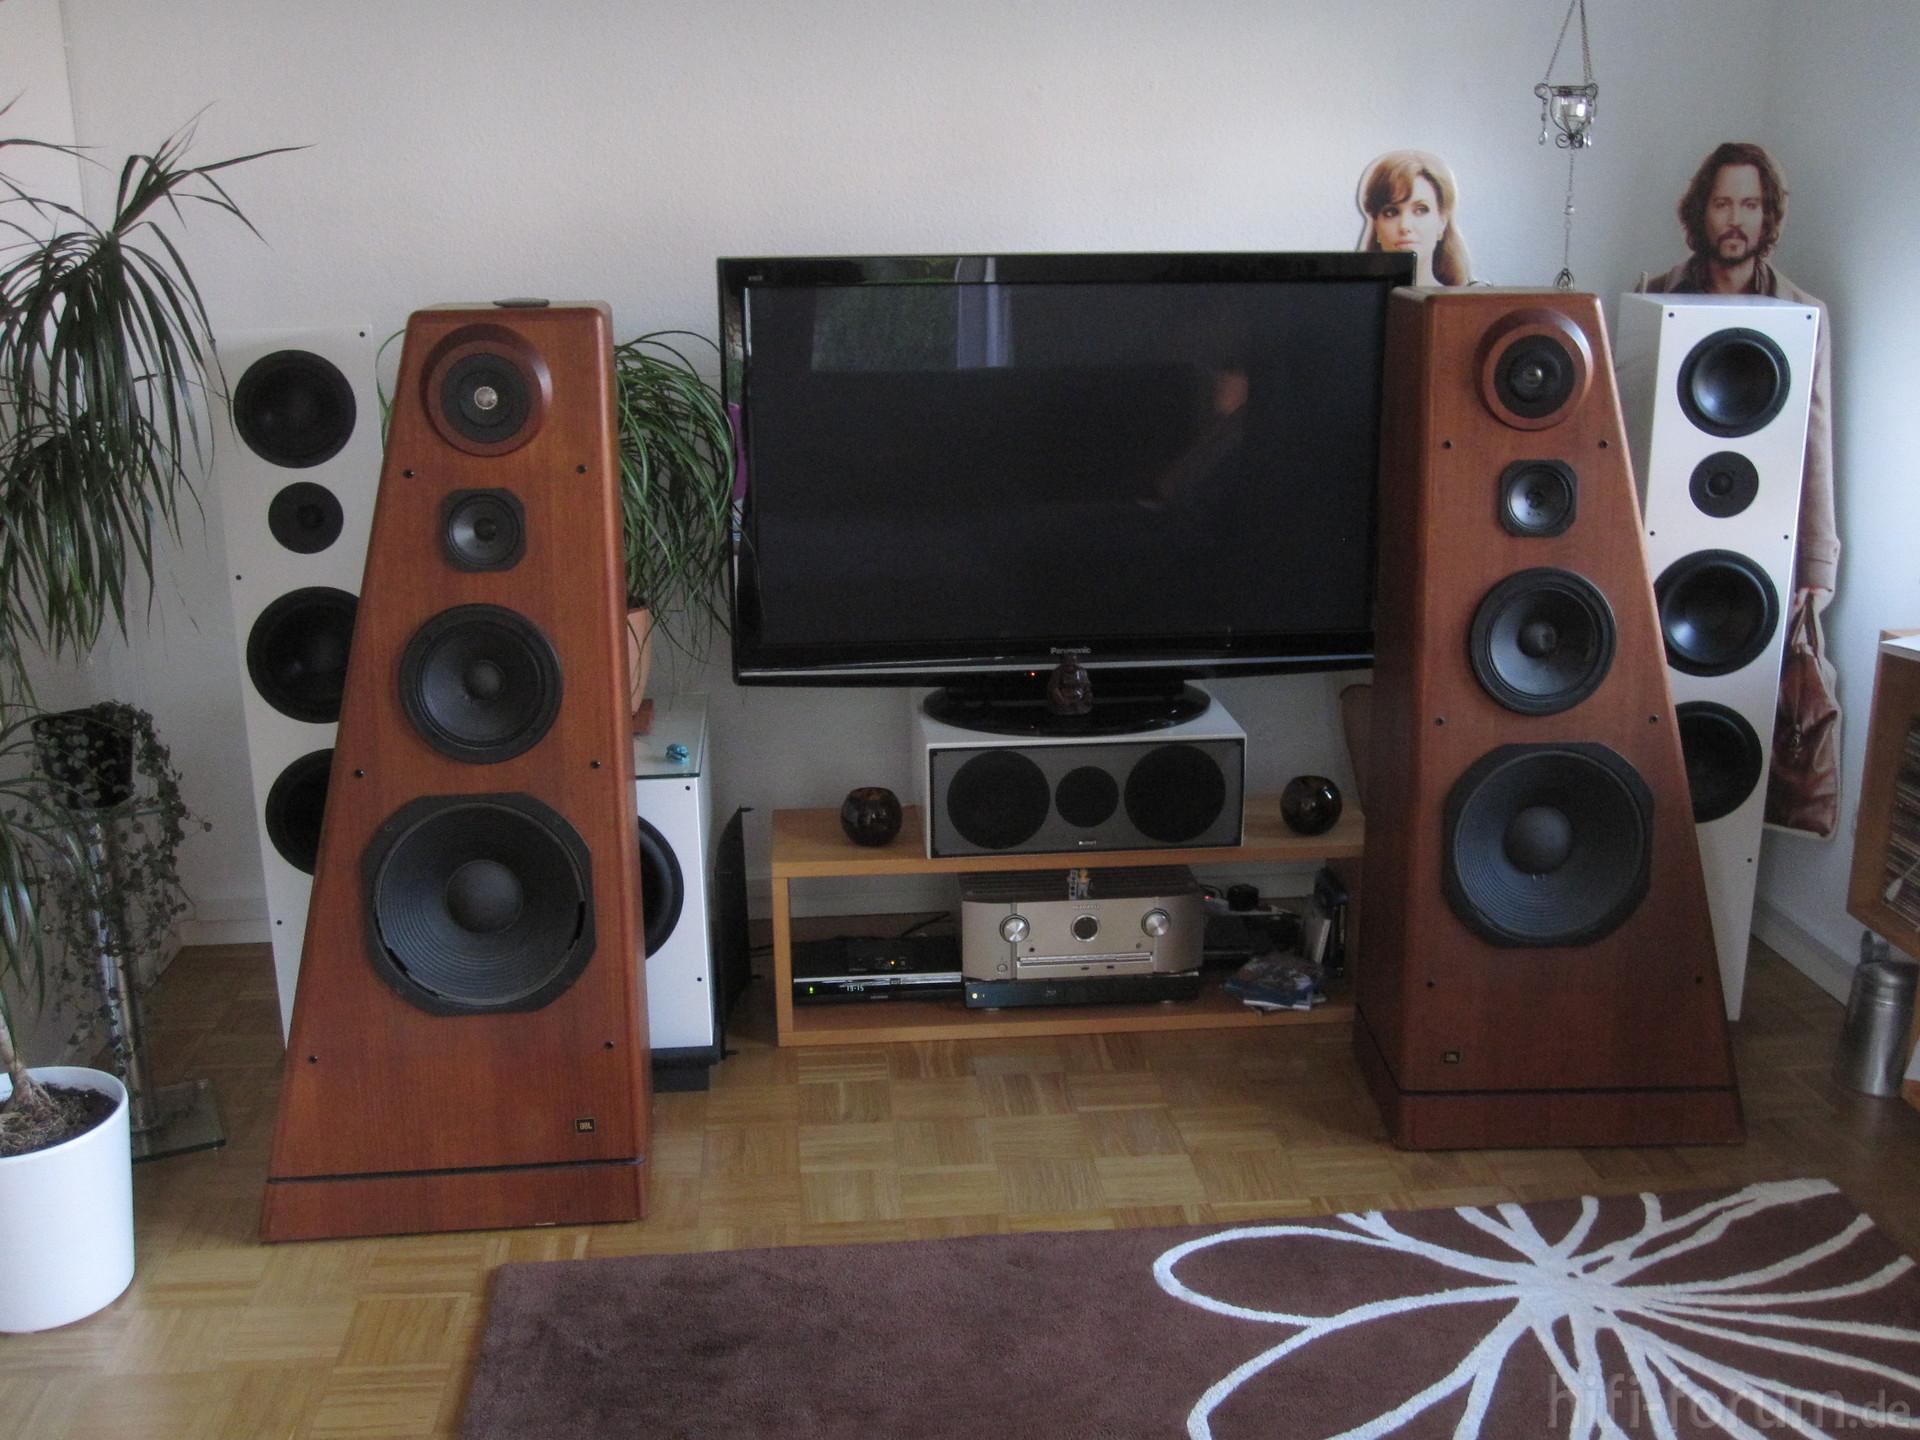 jbl ti 250 hifiklassiker jbl stereo ti hifi forum. Black Bedroom Furniture Sets. Home Design Ideas